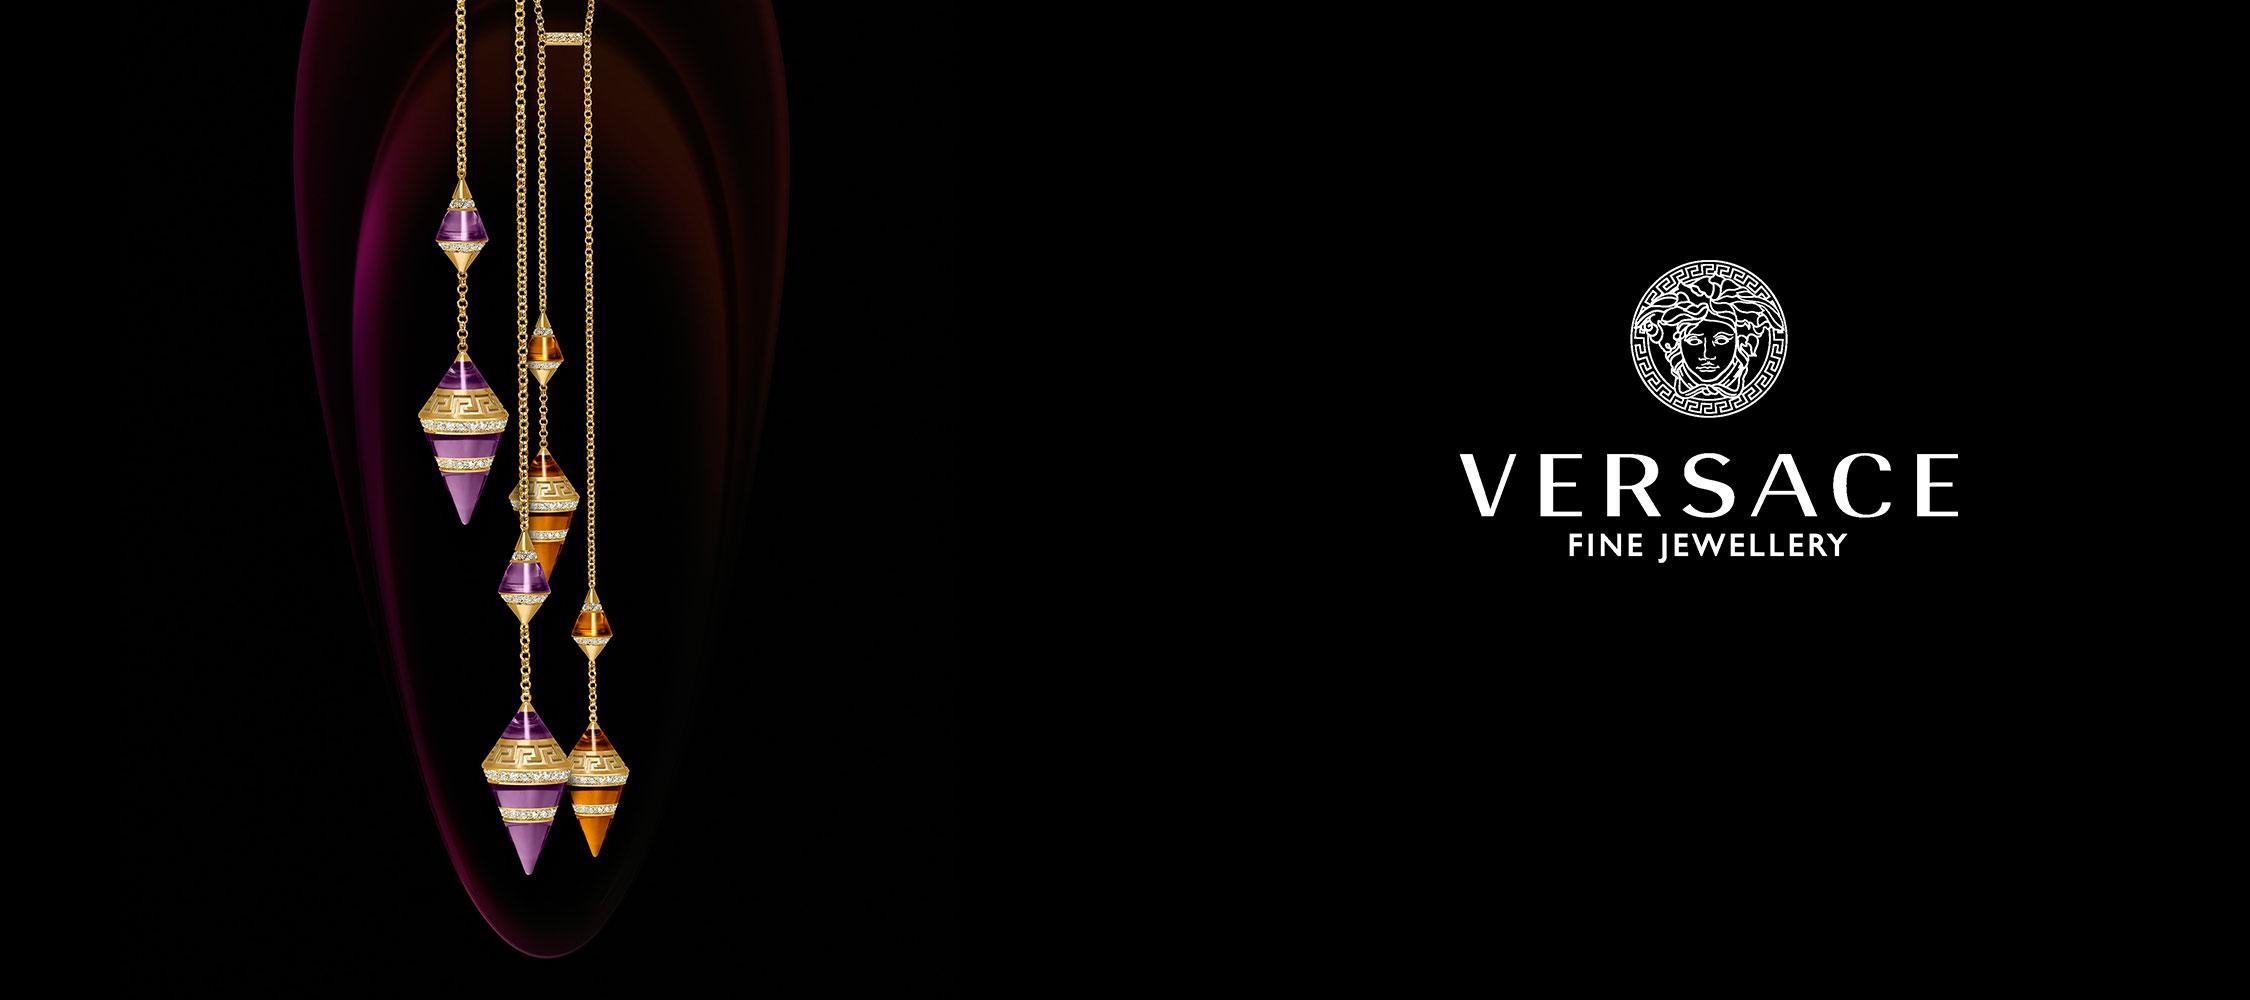 Versace Latest Clothing Men Women Trends for Jewellery (4)